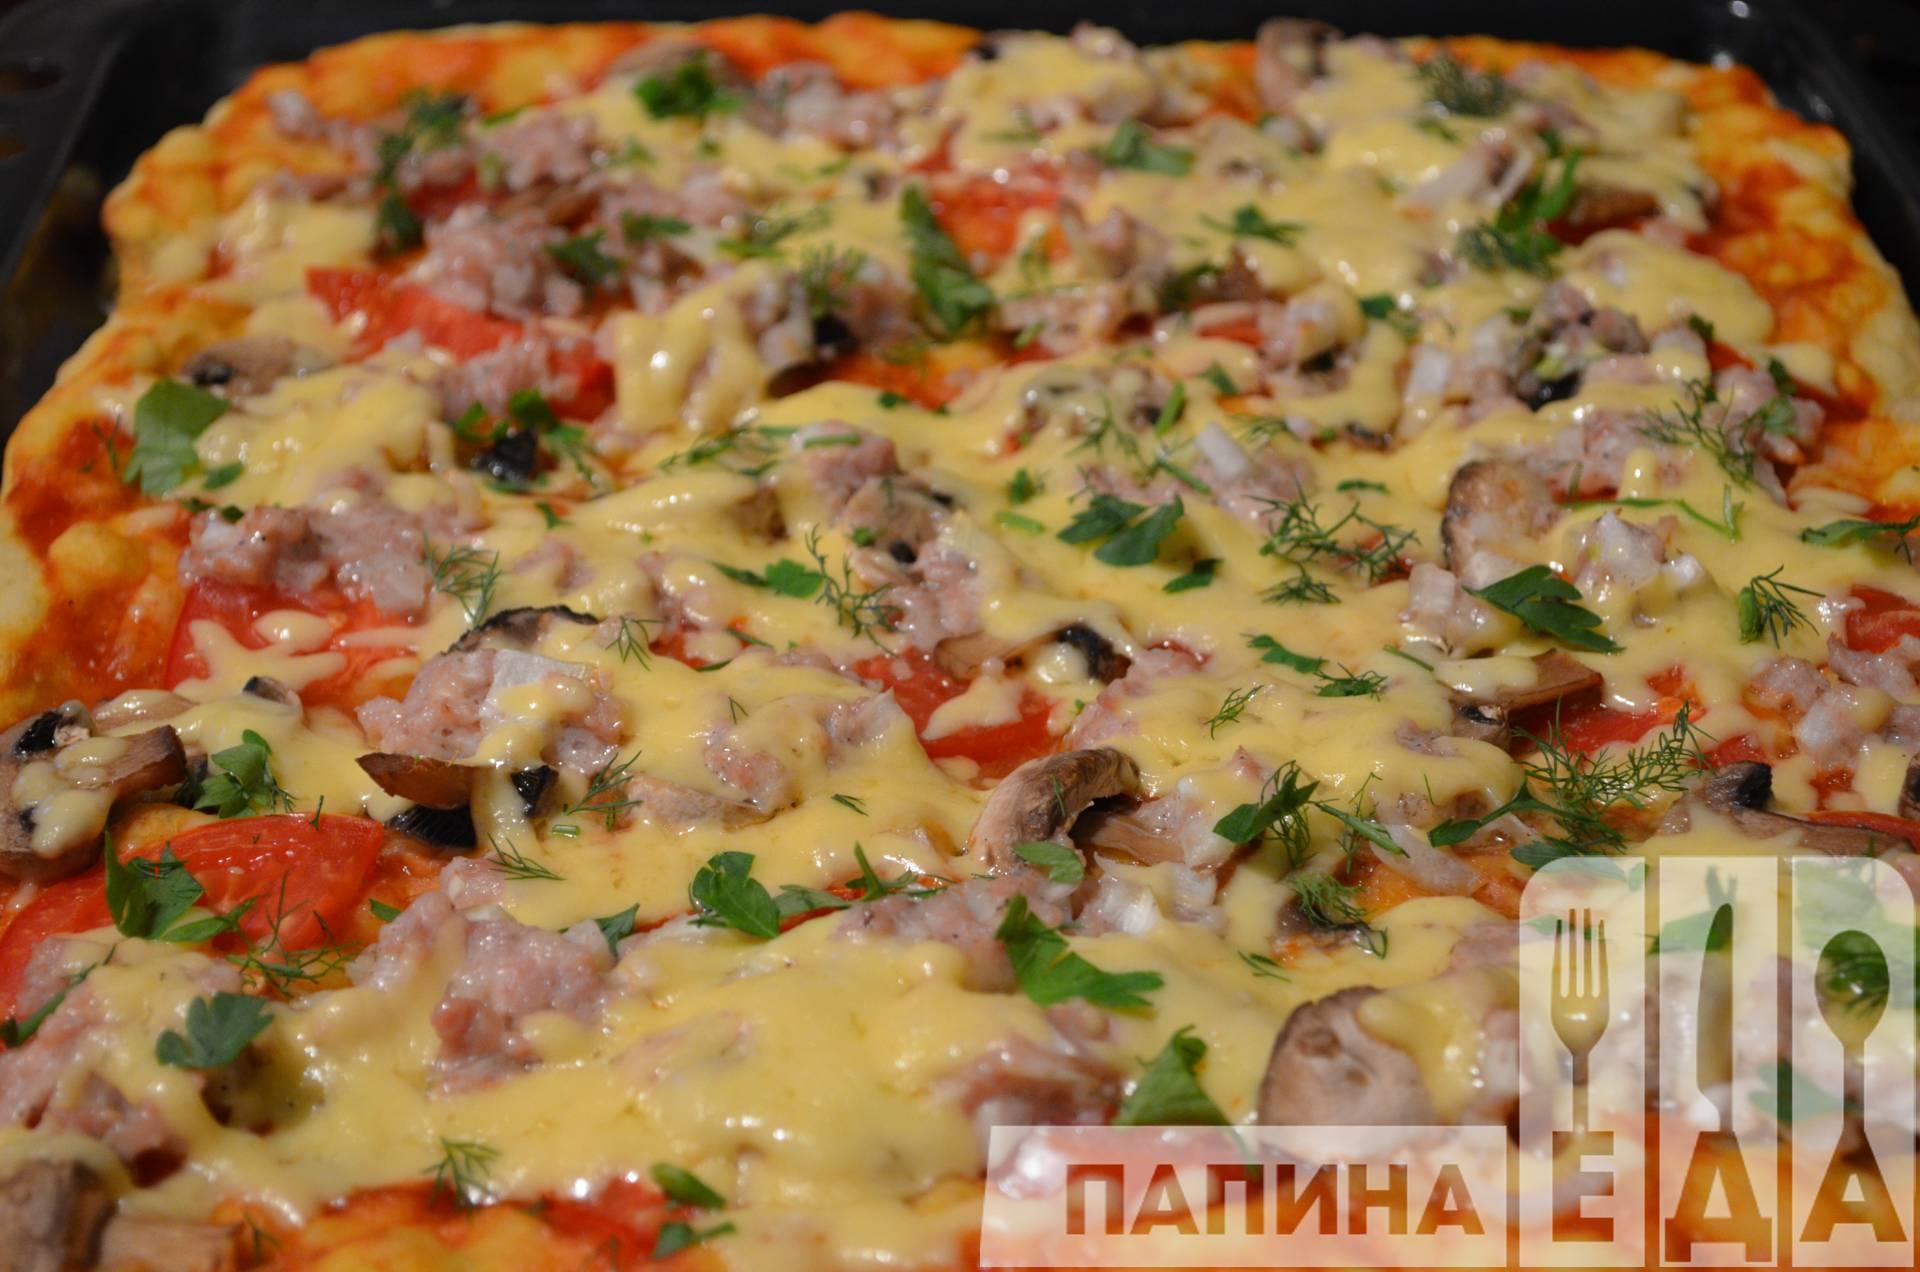 Пицца в домашних условиях рецепт пошагово фото